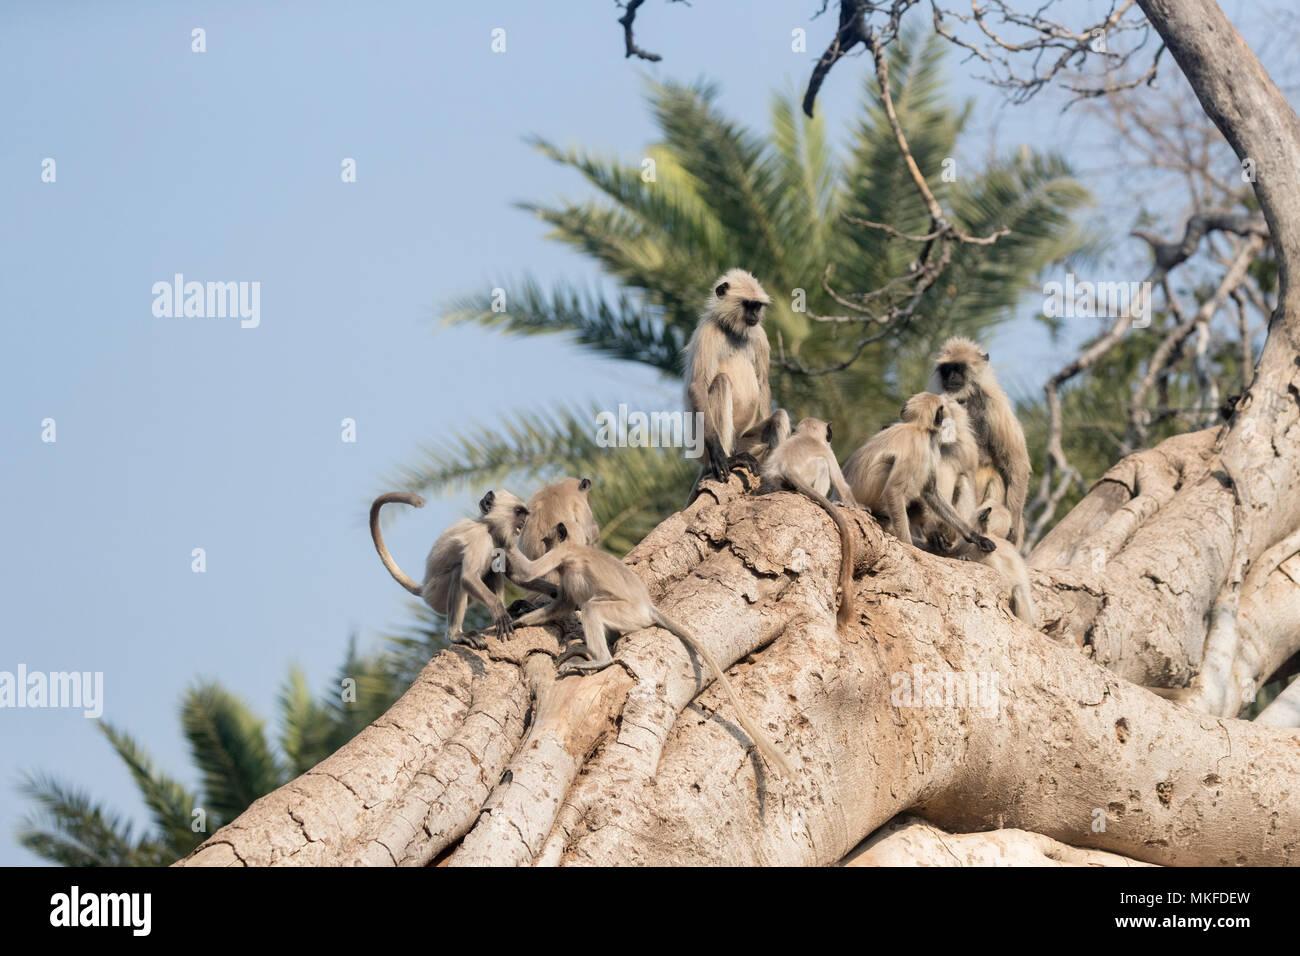 Northern plains gray langur or Hanuman Langur (Semnopithecus entellus), play in a Banyan Tree, Ranthambore National Park, Rajasthan, India - Stock Image